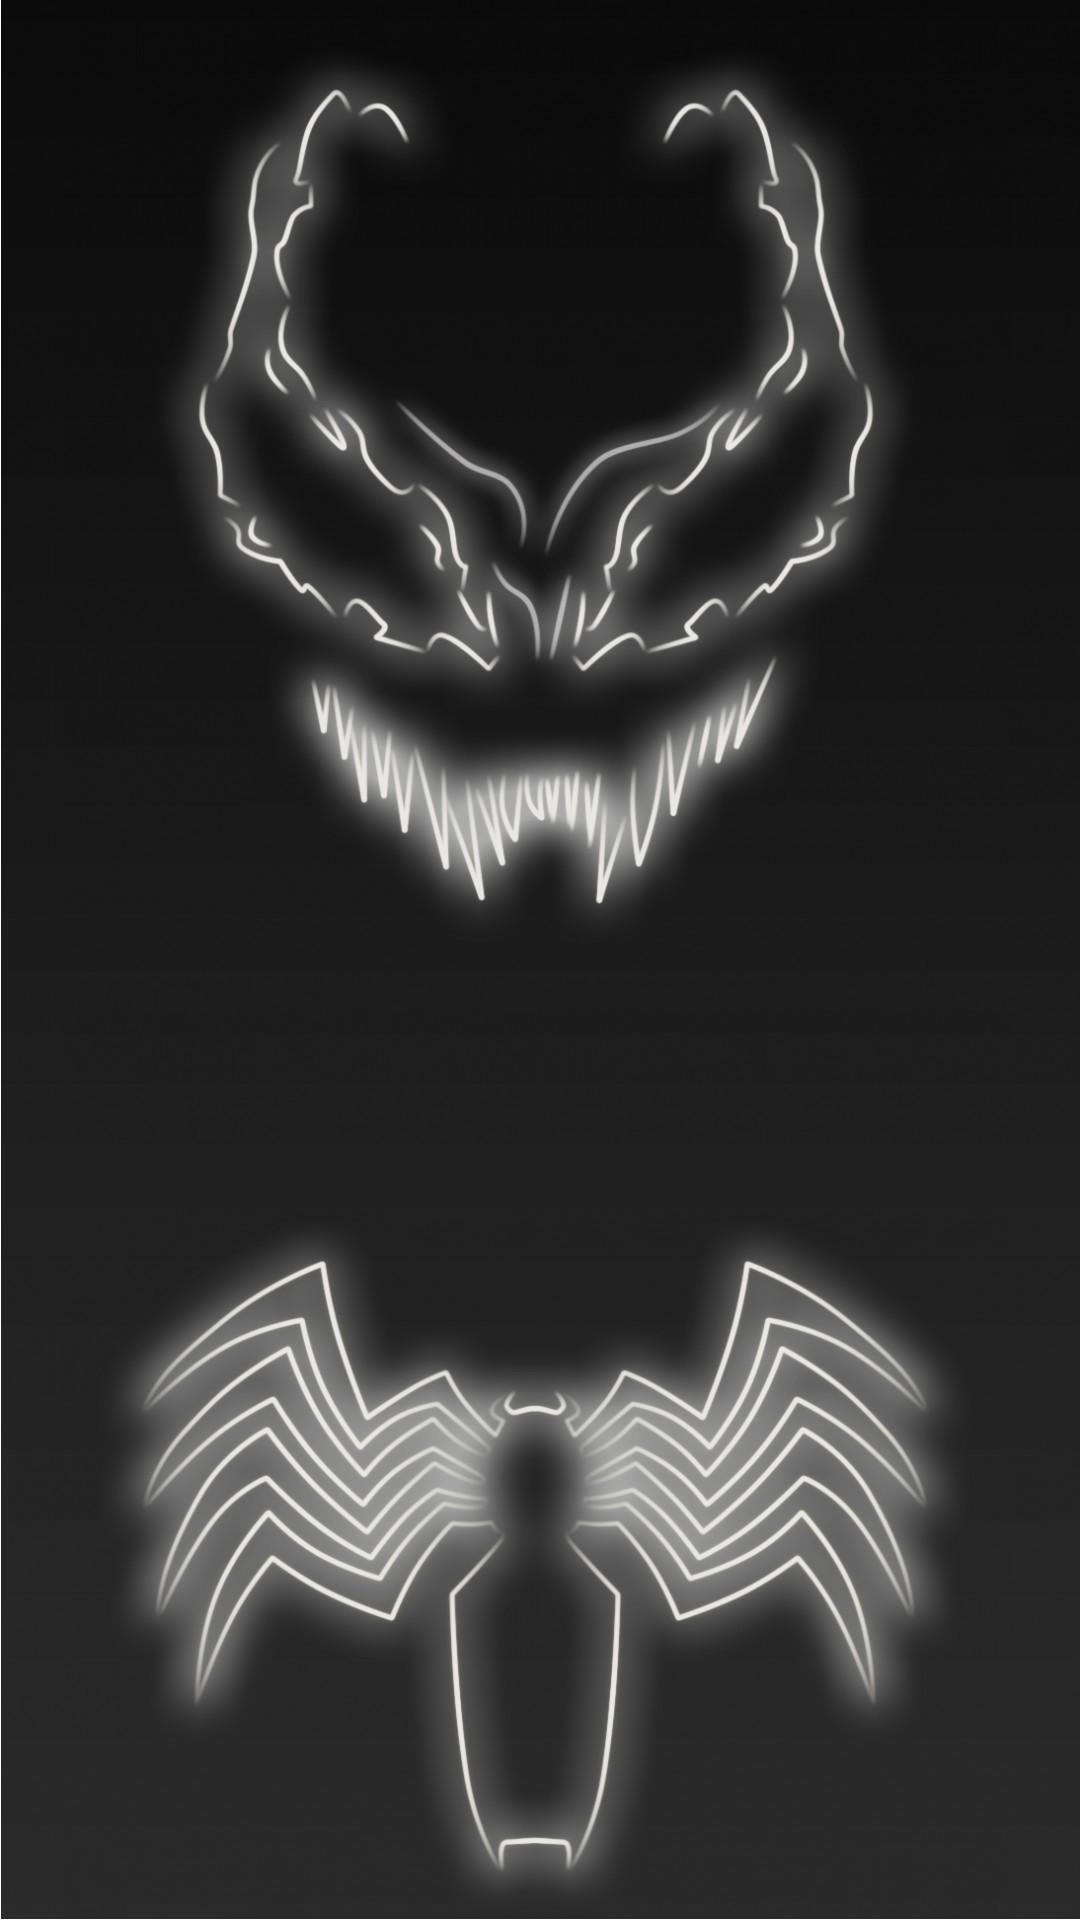 Venom Hd Wallpaper Iphone